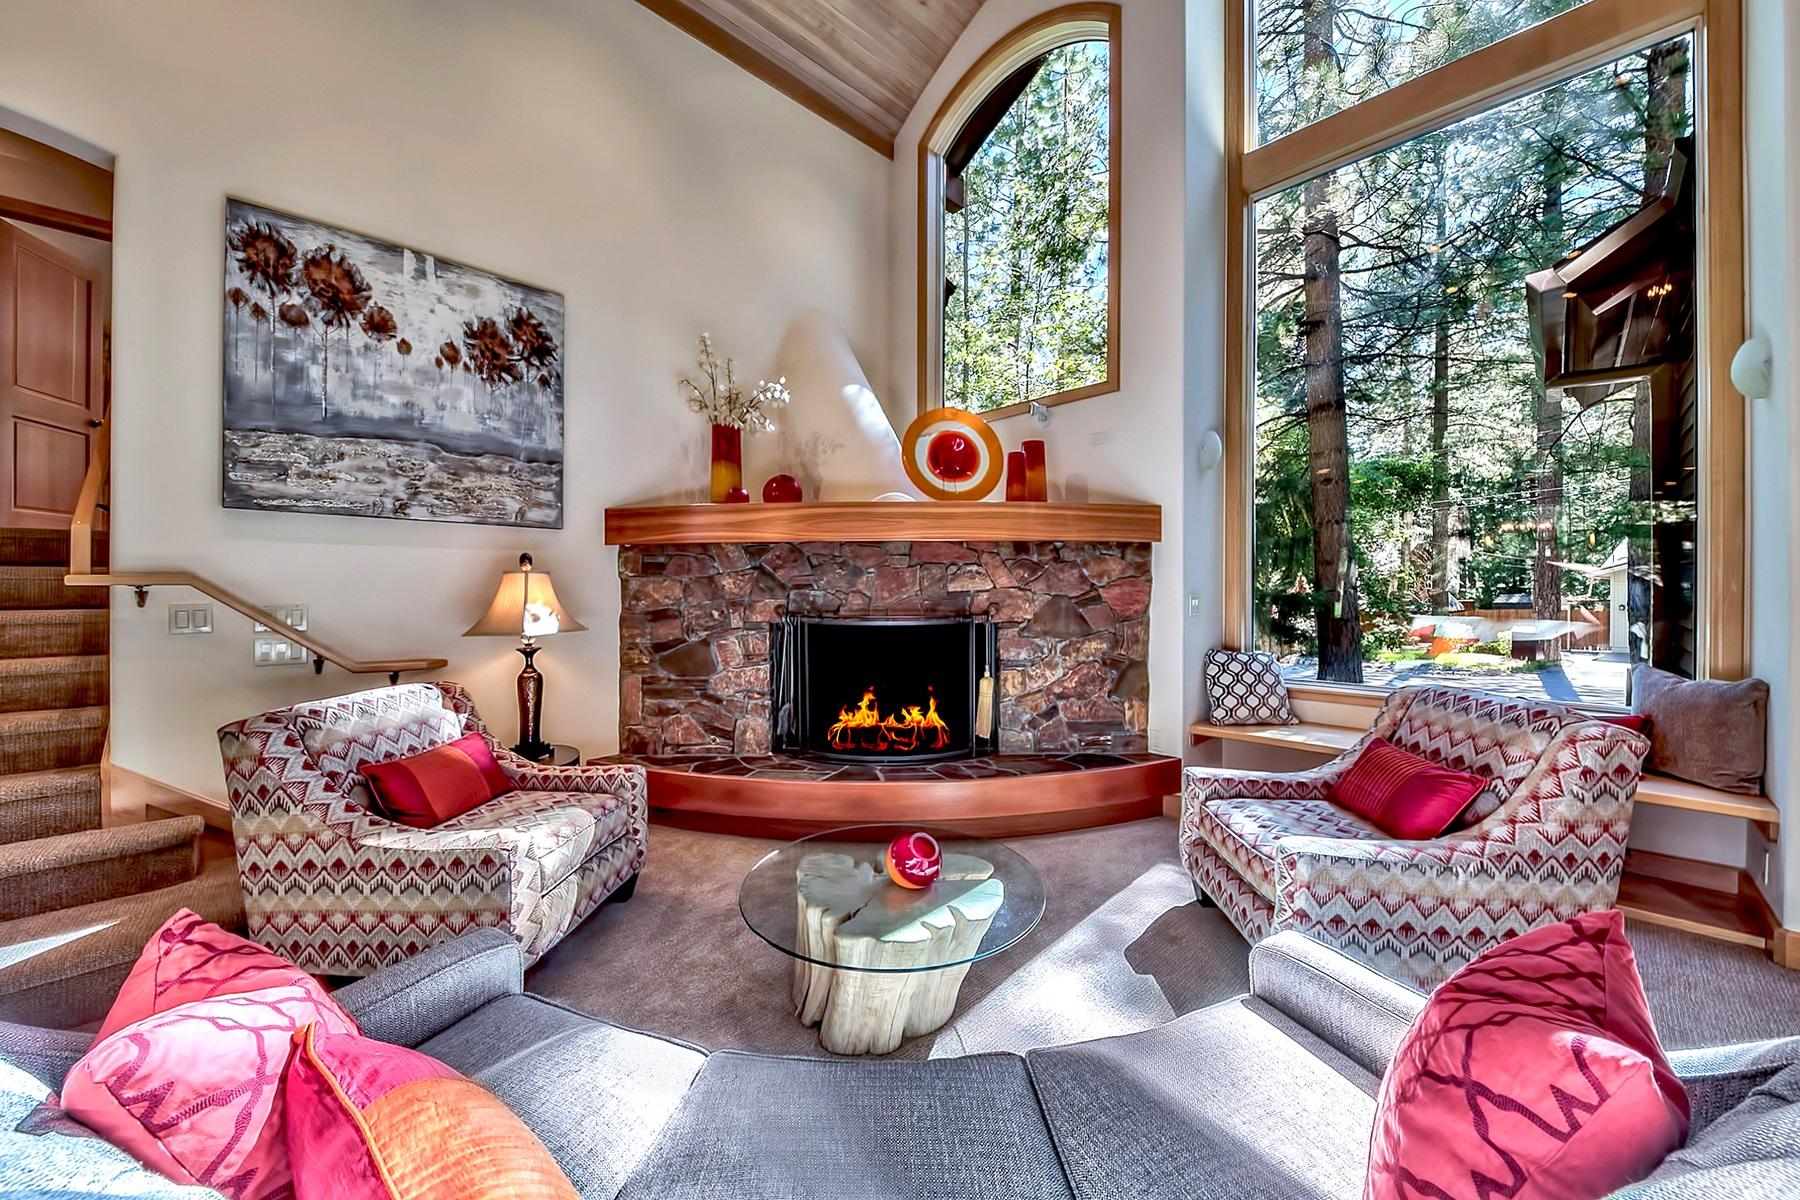 Additional photo for property listing at 130 Rubicon Peak Lane, Incline Village, Nevada 130 Rubicon Peak Lane Incline Village, Nevada 89451 United States